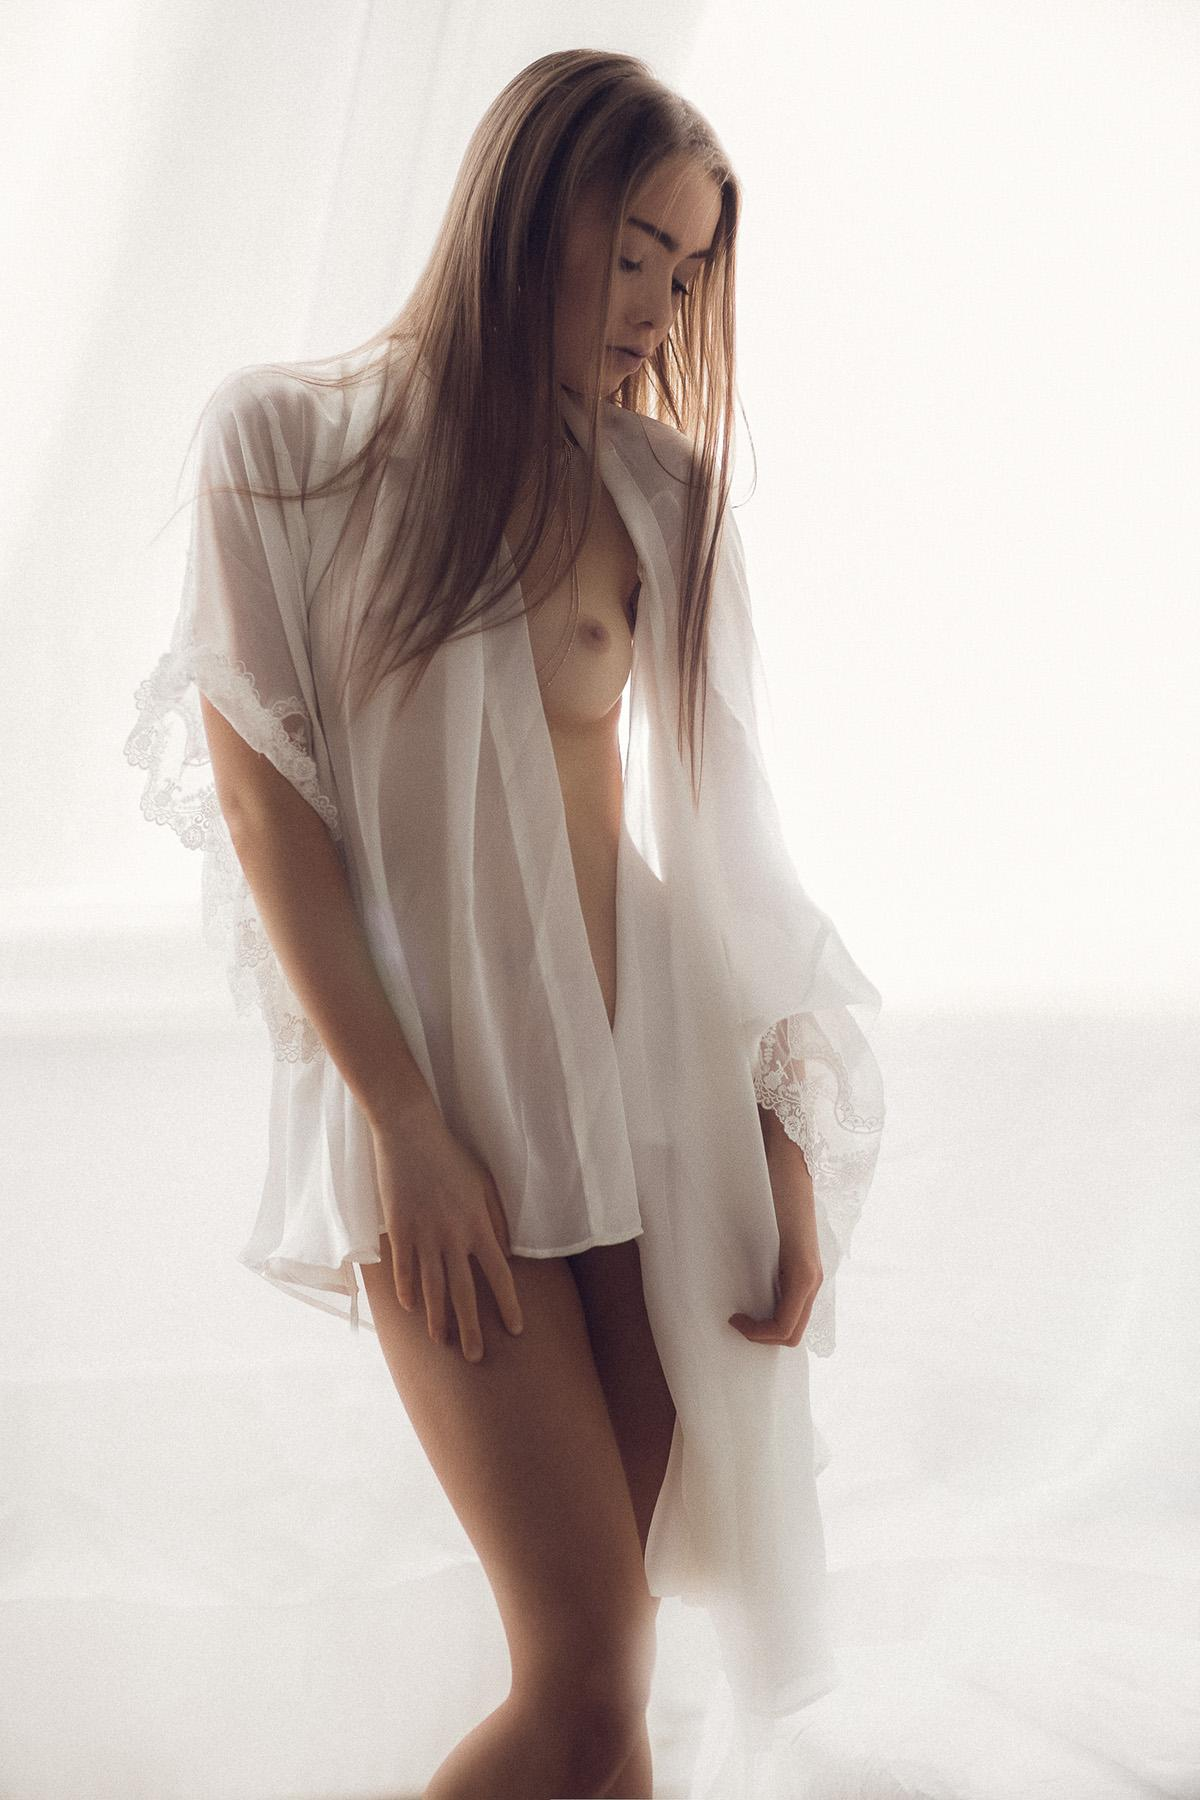 Ida Gottlieb Taarnhoj - Thomas Agatz photoshoot